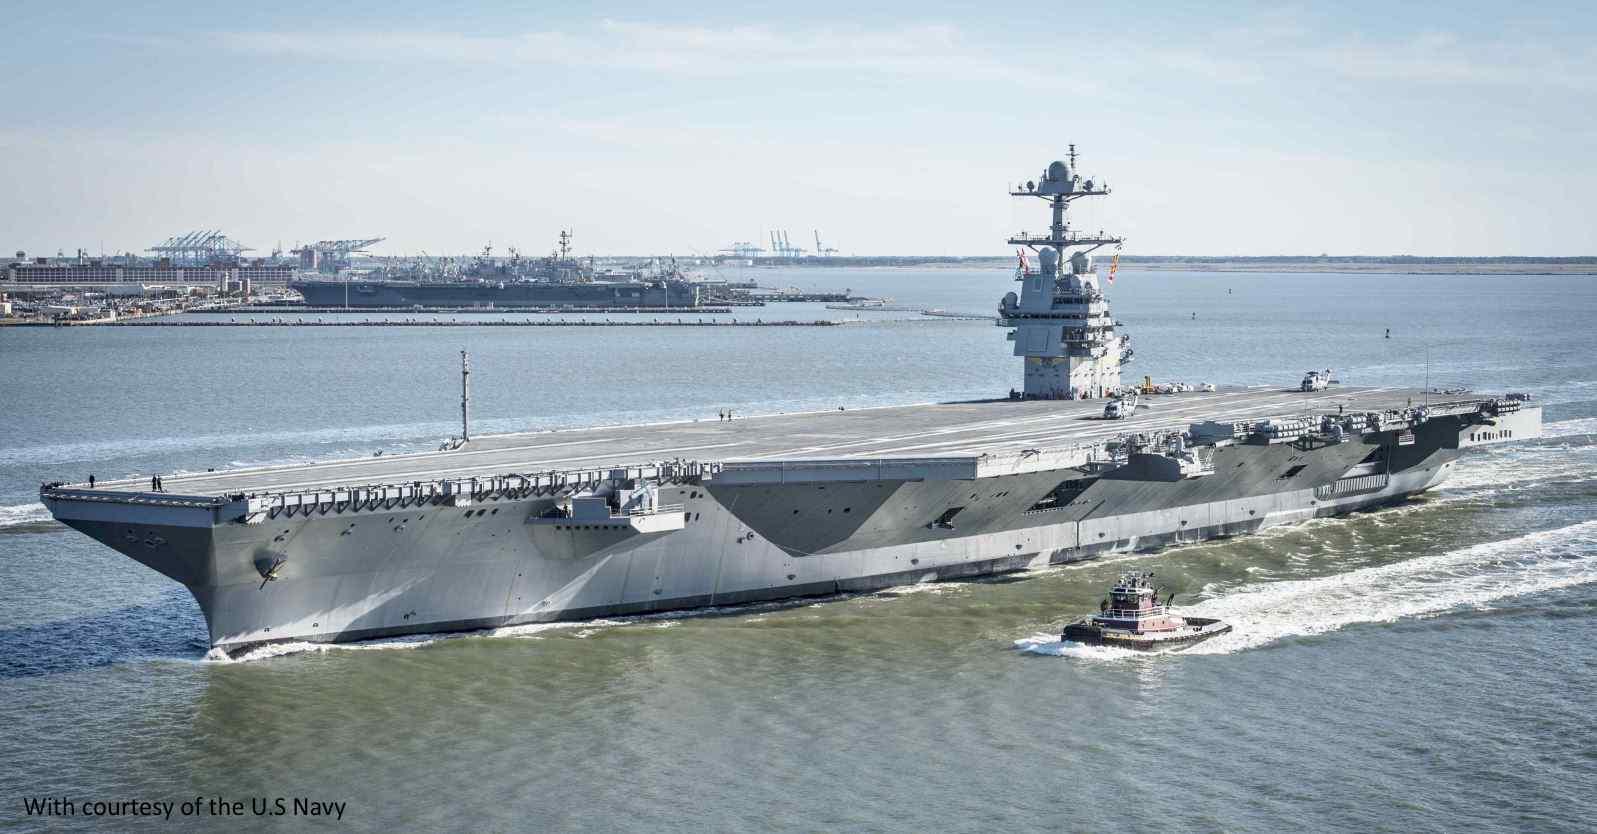 new_USS%20GERALD%20FORD%20%28US%20NAVY%29.JPG